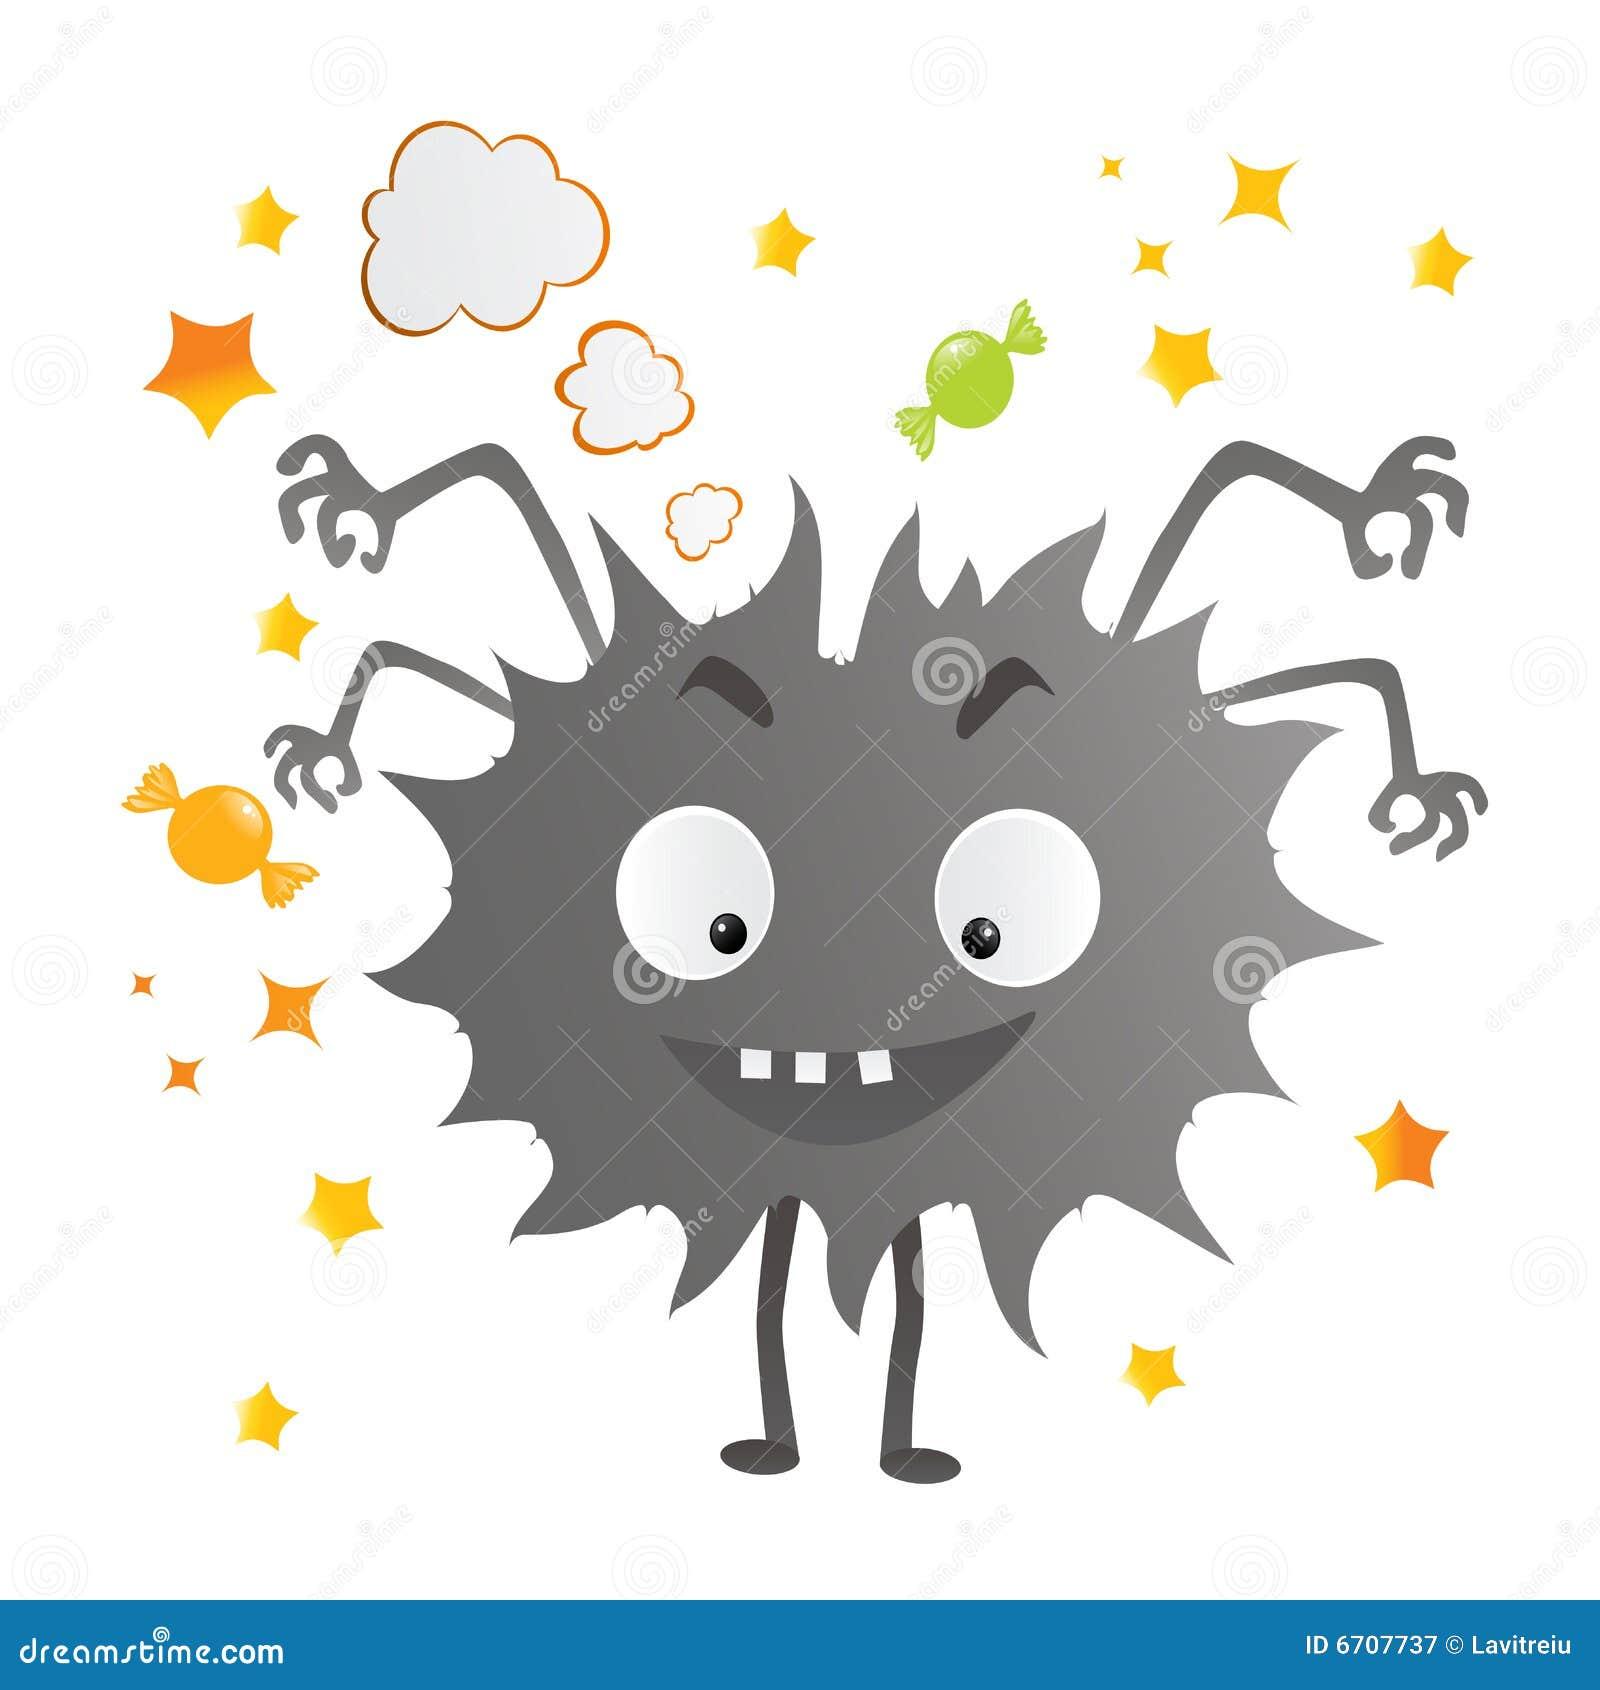 Halloween Party Cartoon Royalty Free Stock Photography - Image ...